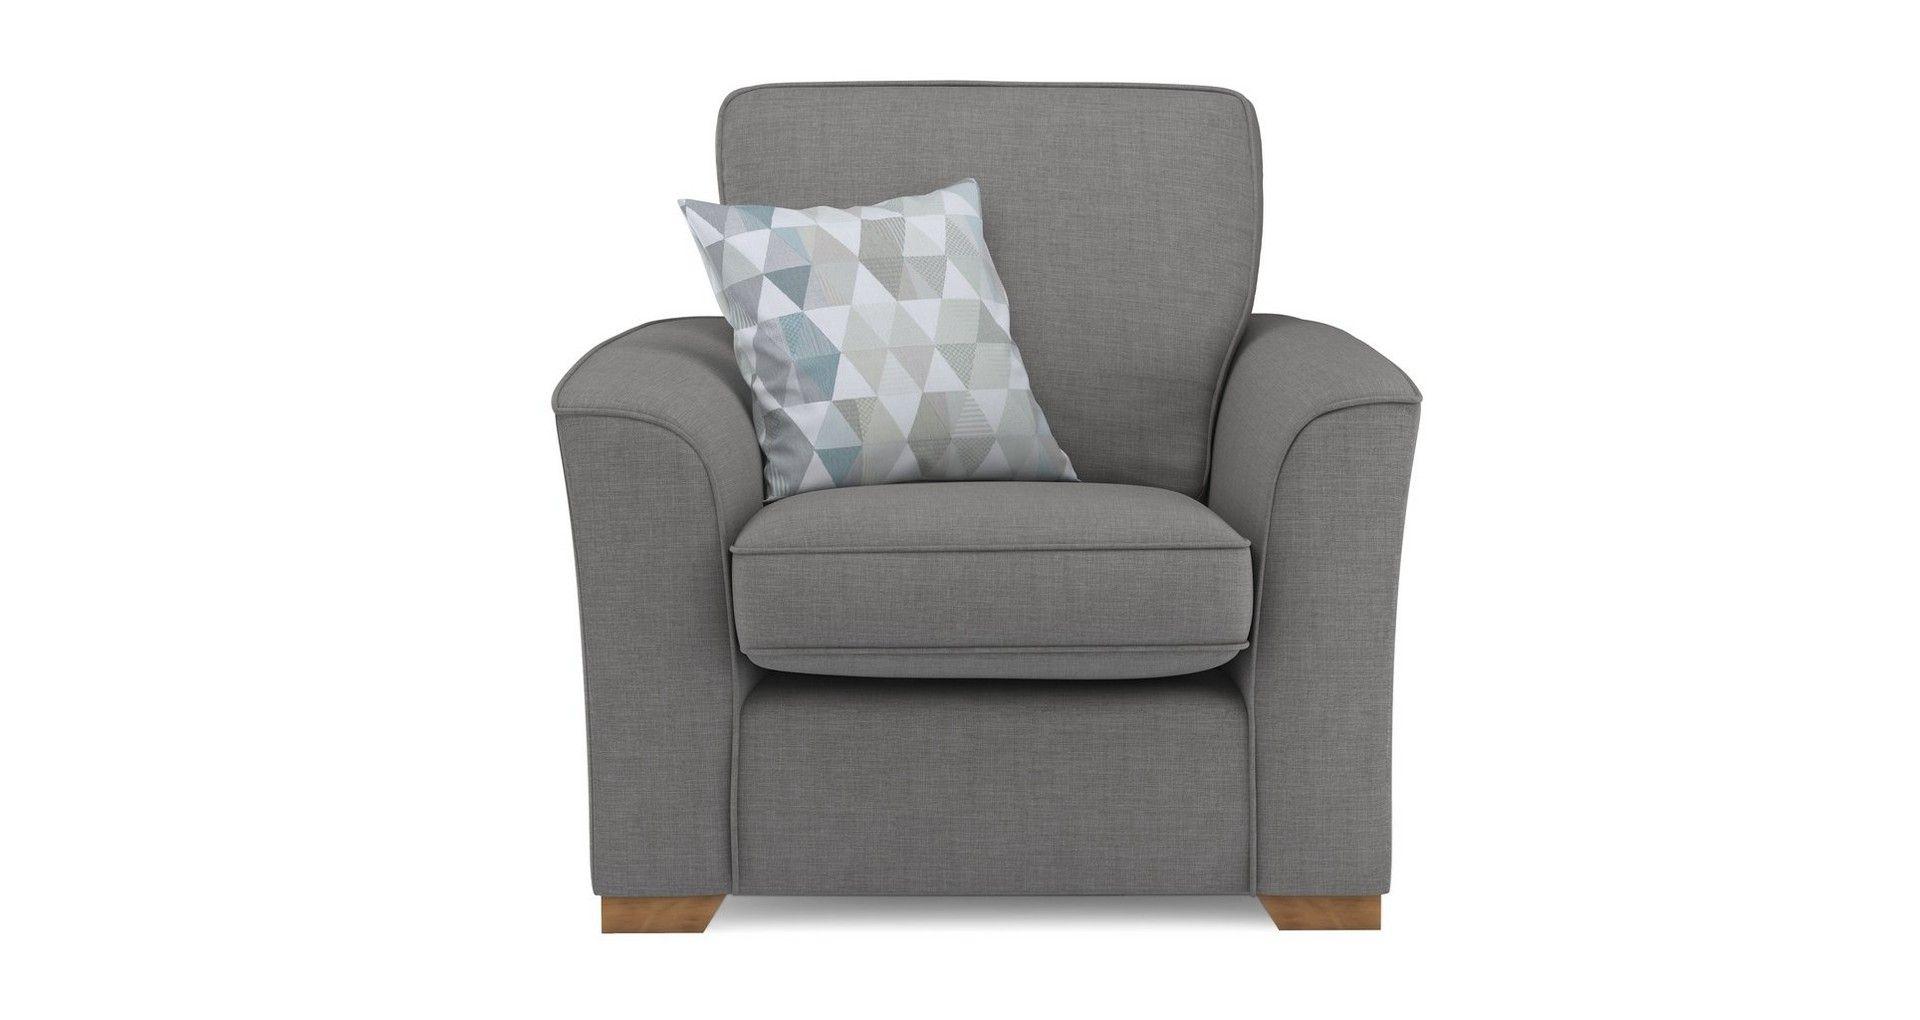 Beau Armchair Revive   DFS   Armchair, Home decor, Living room